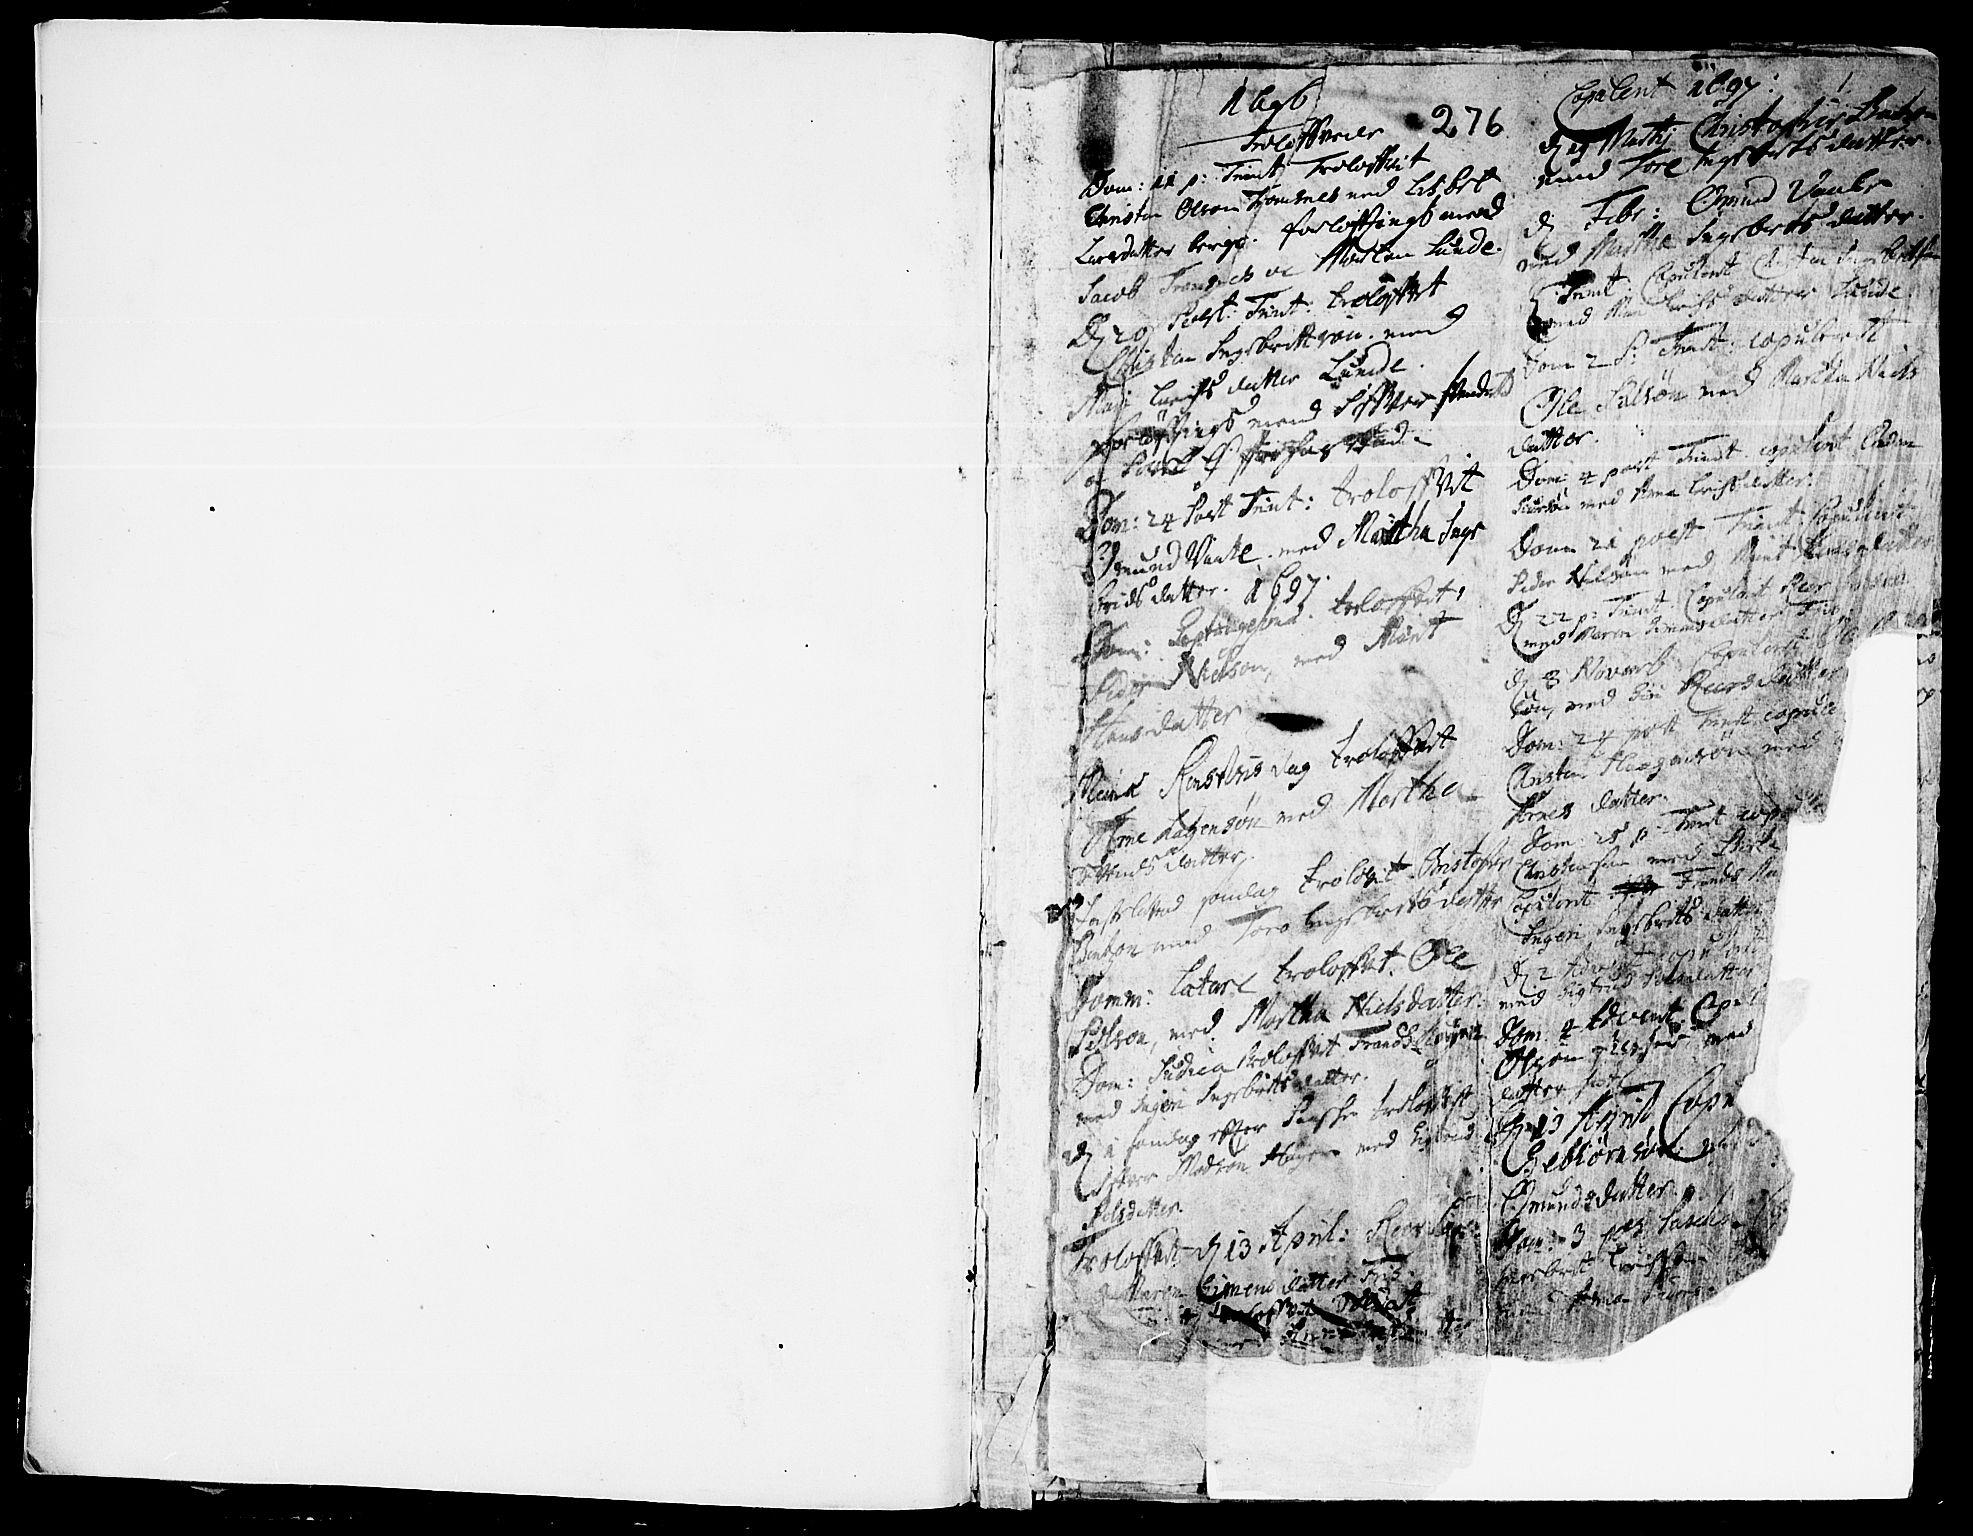 SAH, Ringebu prestekontor, Ministerialbok nr. 1, 1696-1733, s. 0-1